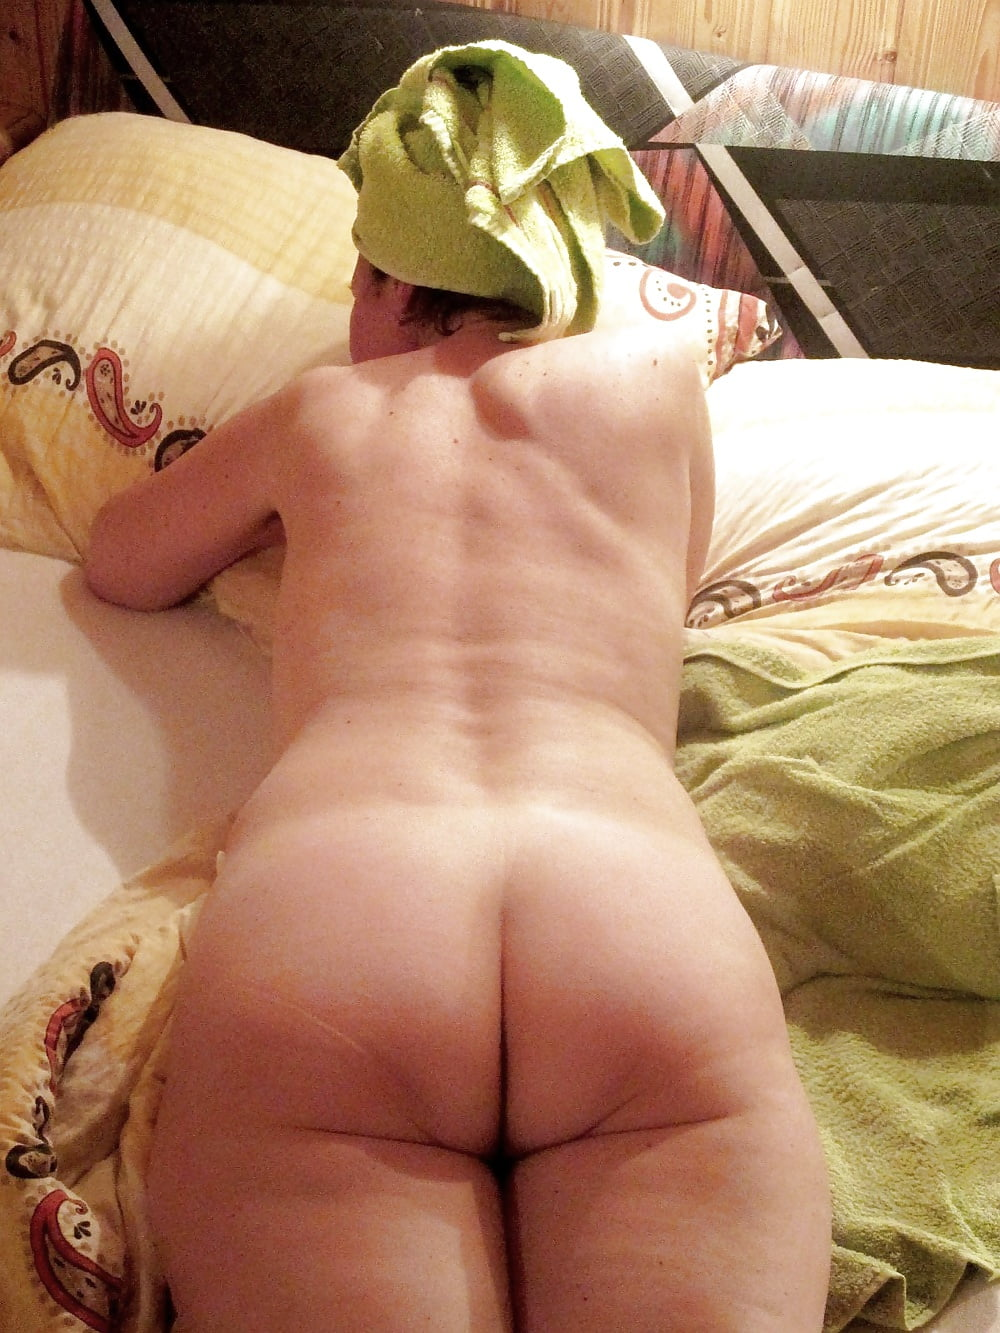 Flabby chubby ass